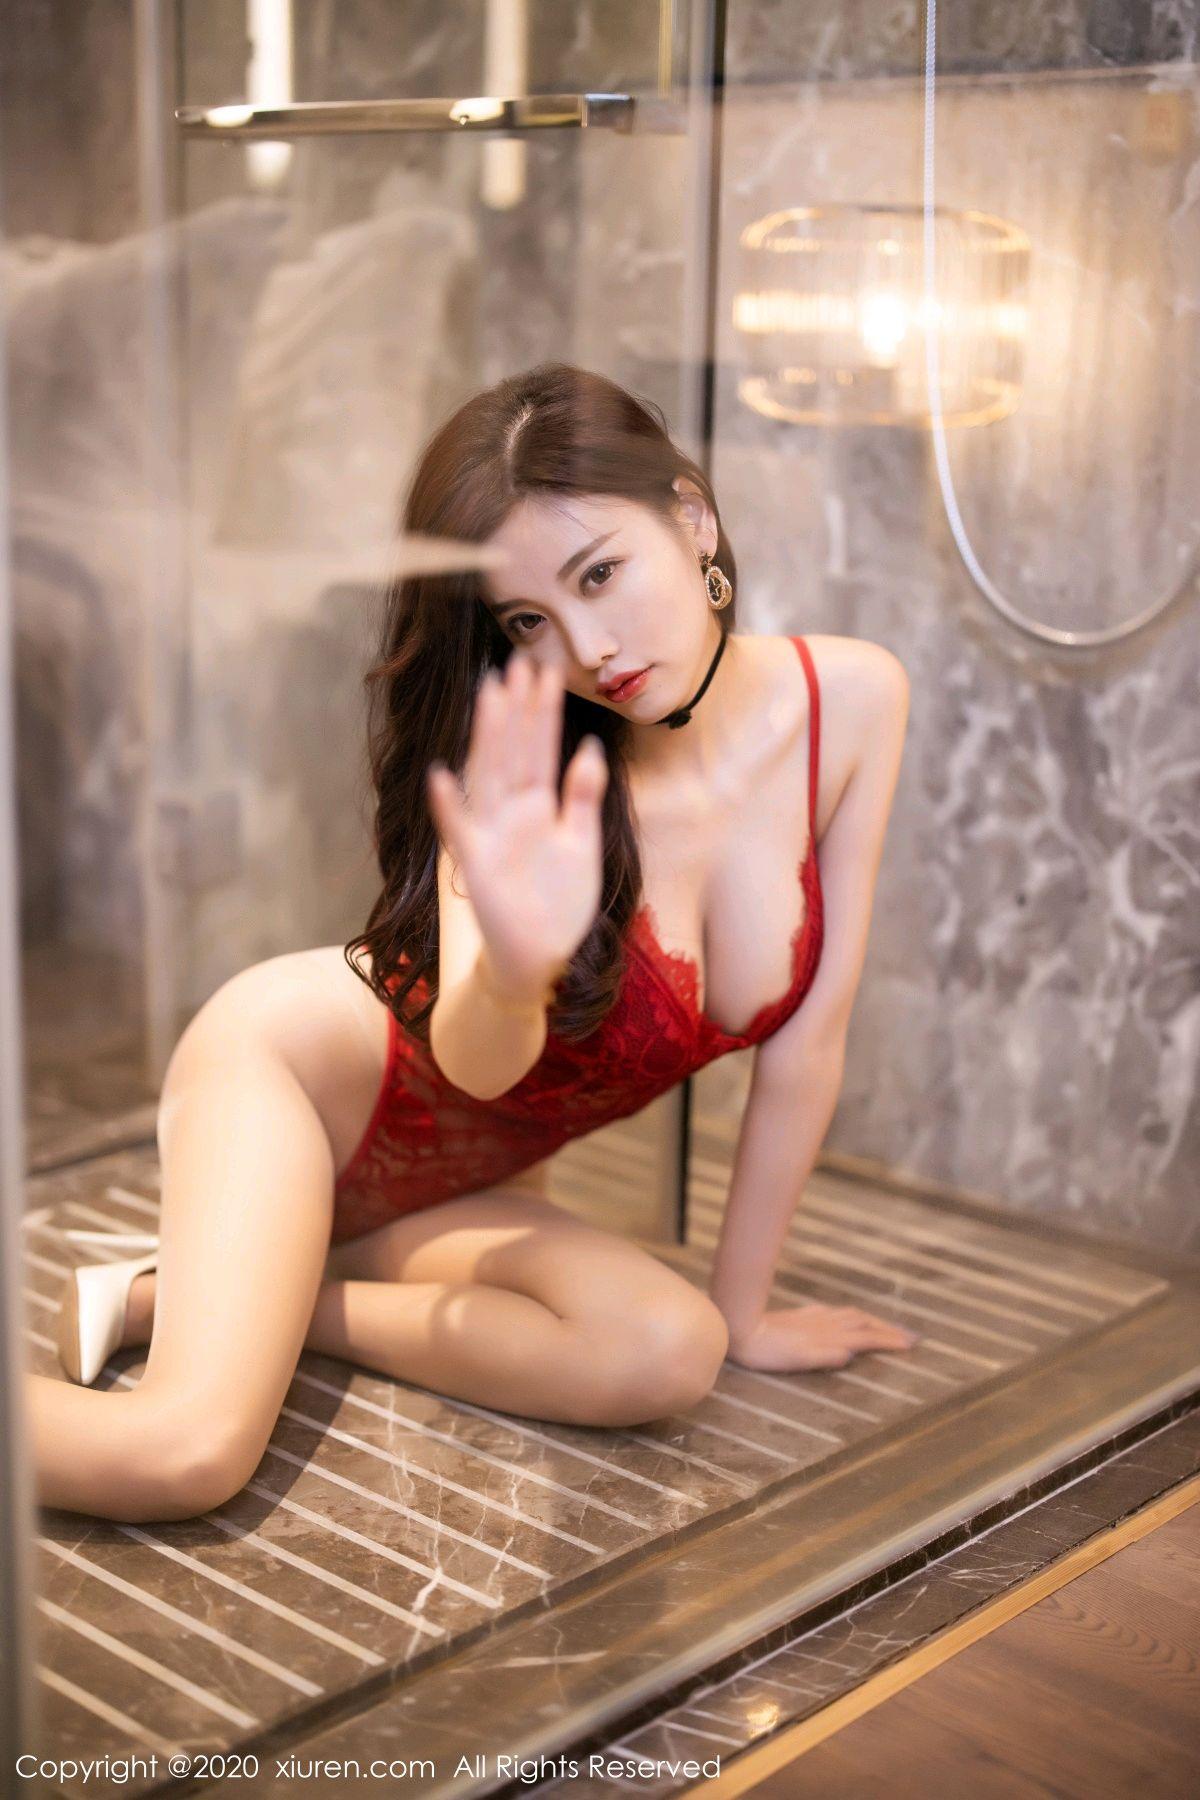 [XiuRen] Vol.2671 Yang Chen Chen 50P, Underwear, Xiuren, Yang Chen Chen